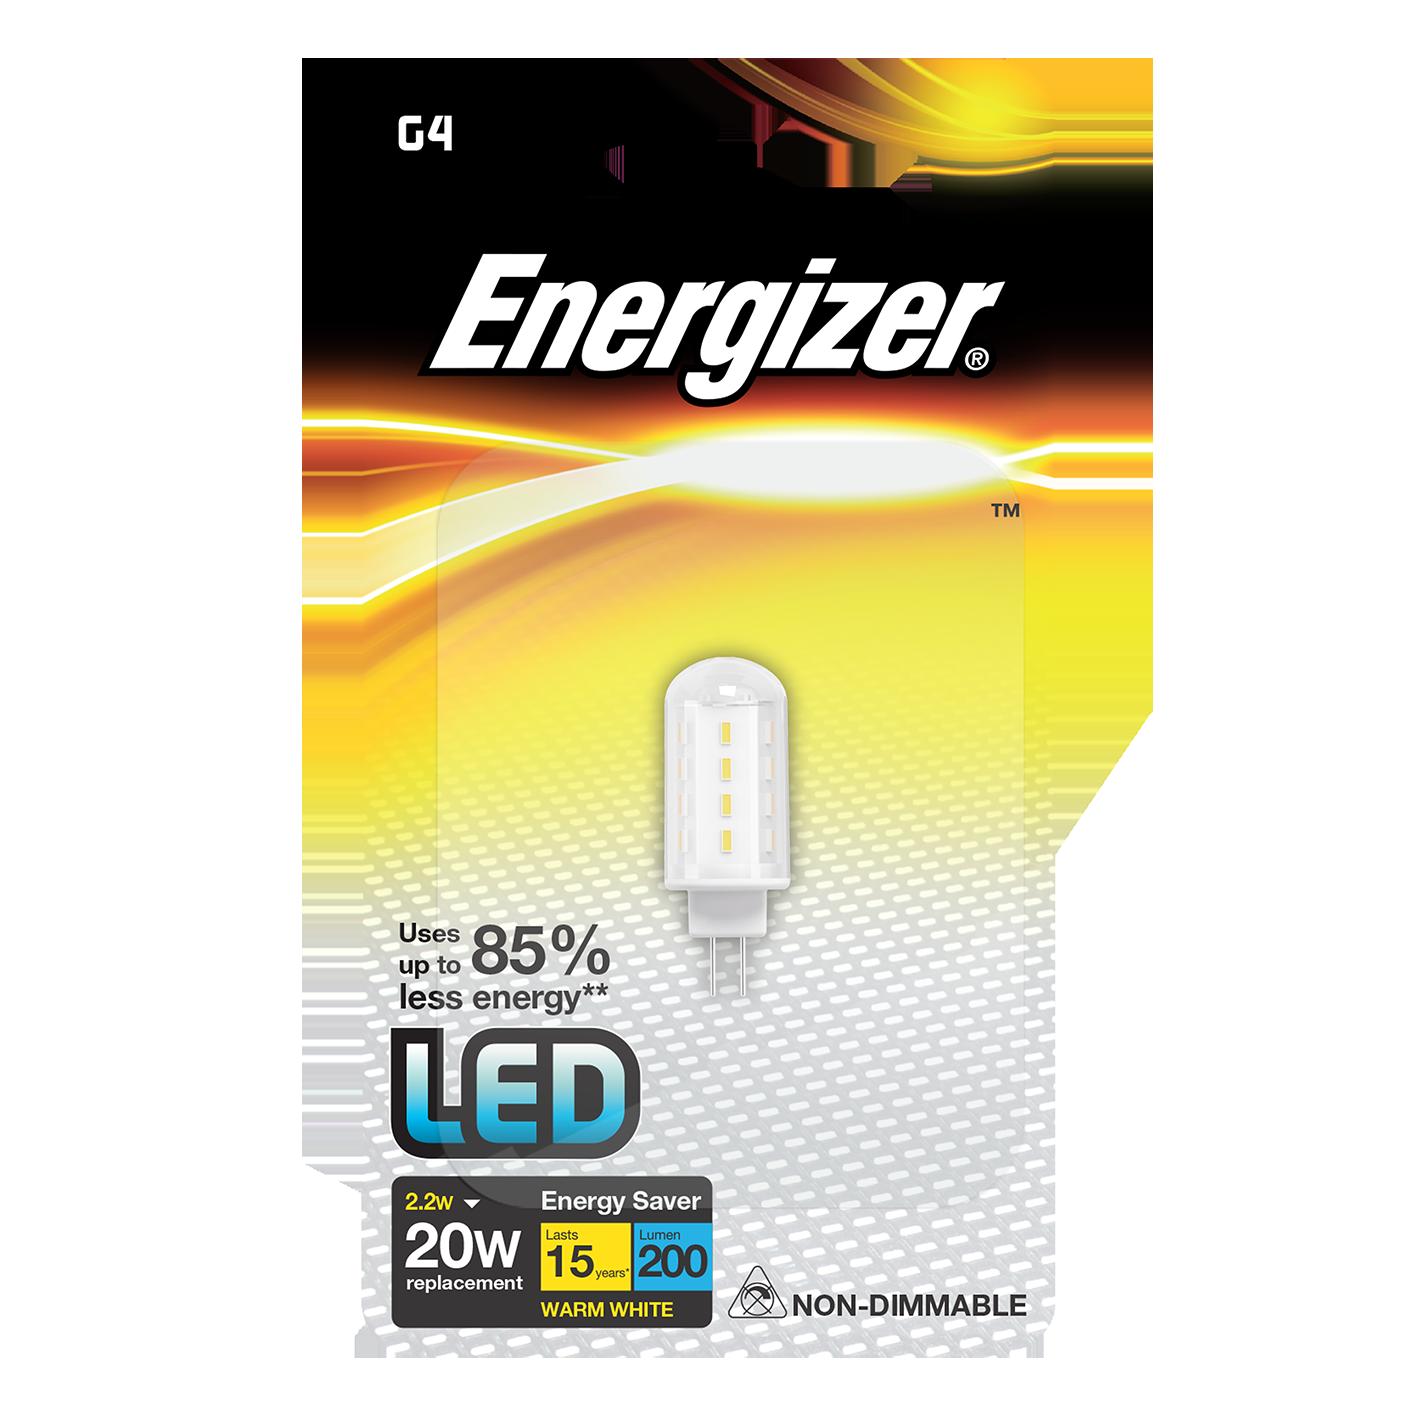 ENERGIZER G4 - 20W